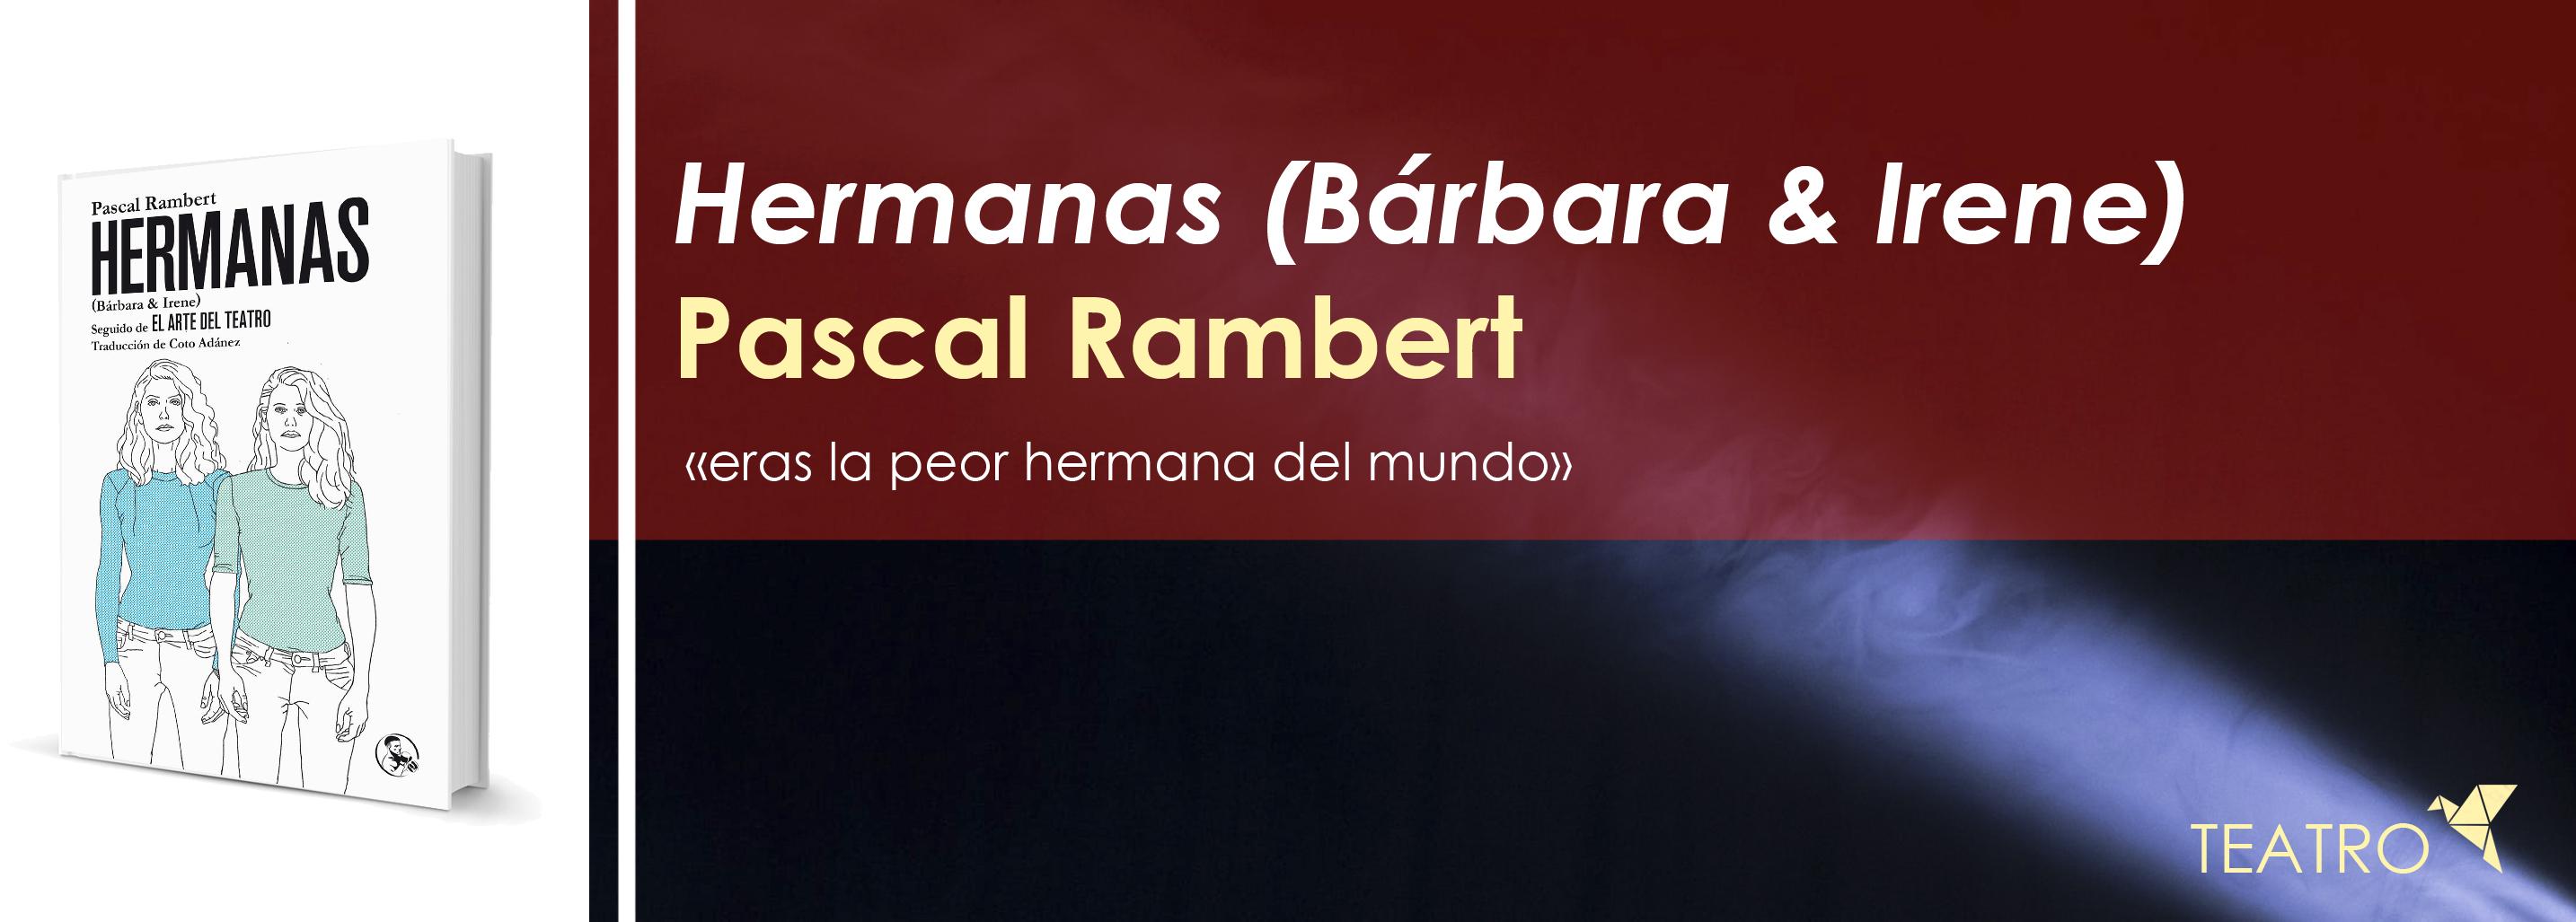 Hermanas (Bárbara & Irene), de Pascal Rambert